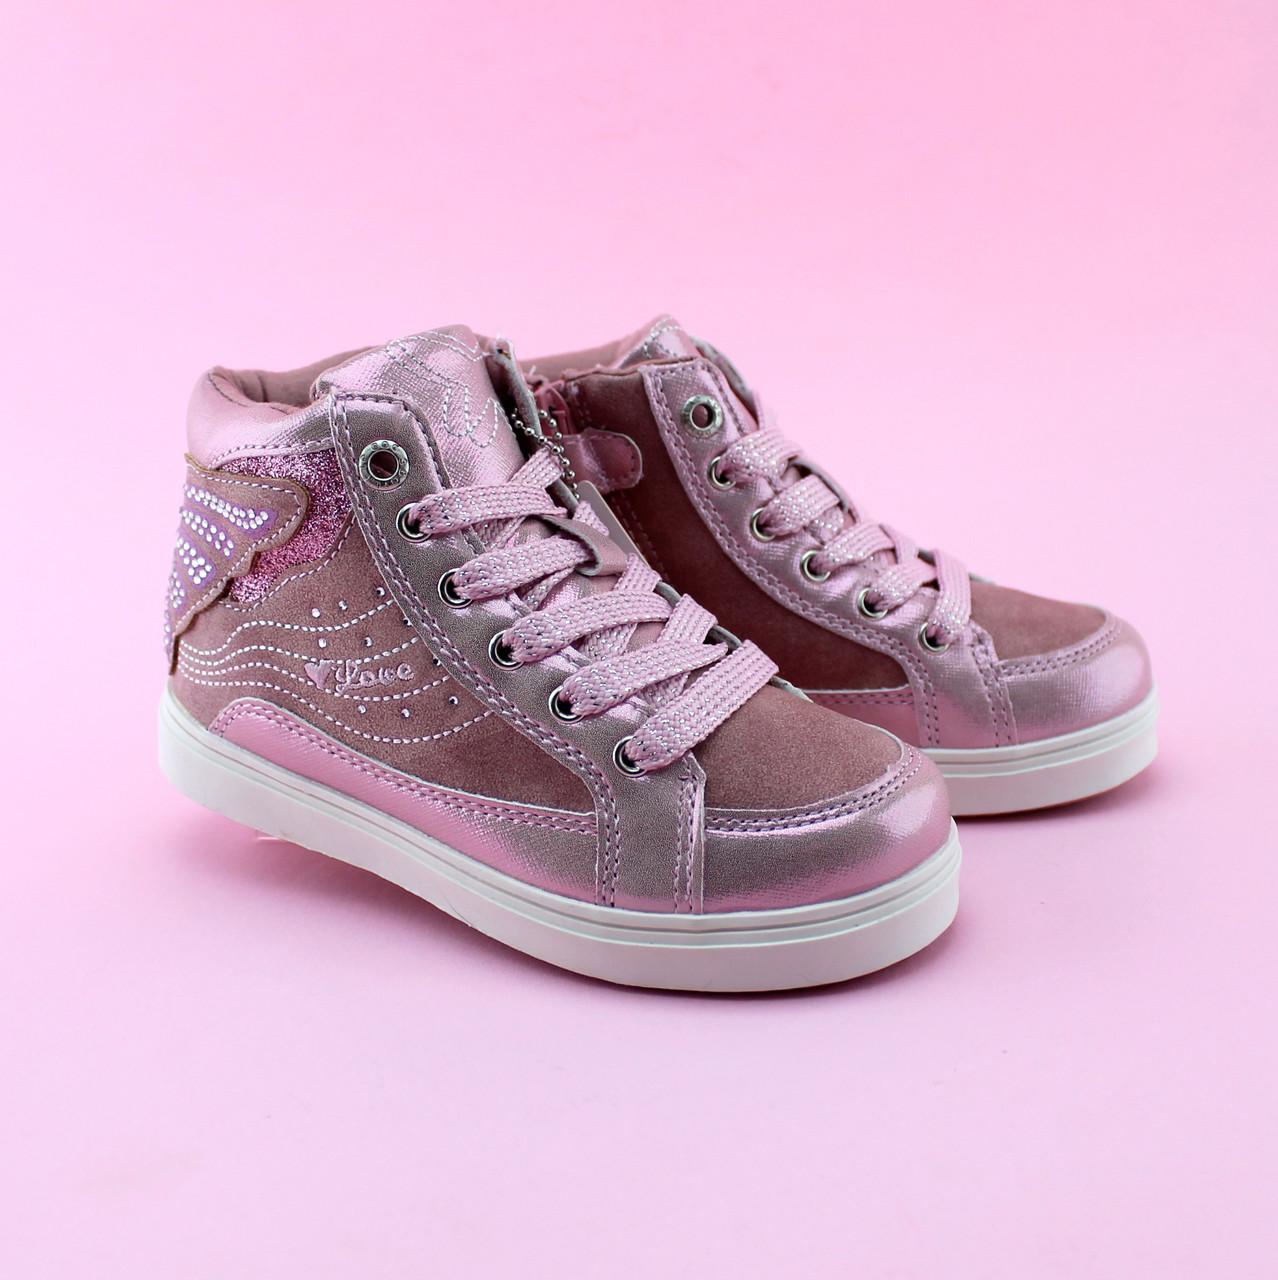 Ботинки деми девочке розовые Бабочка тм BiKi размер 29,31,32